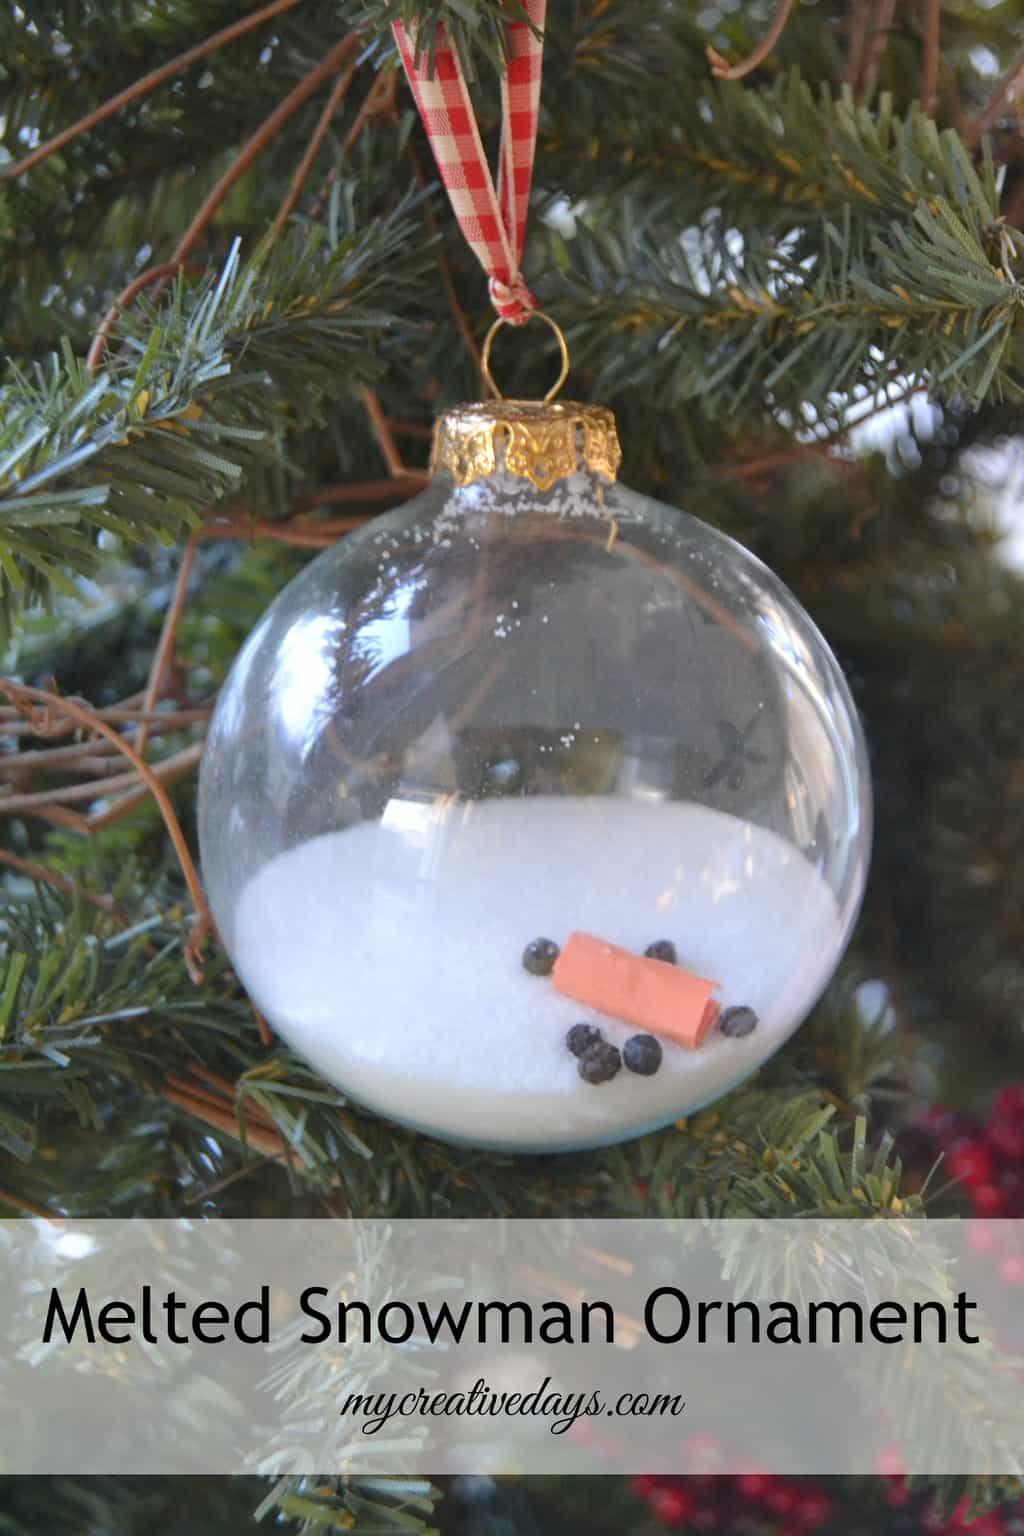 Melted Snowman Ornament mycreativedays.com